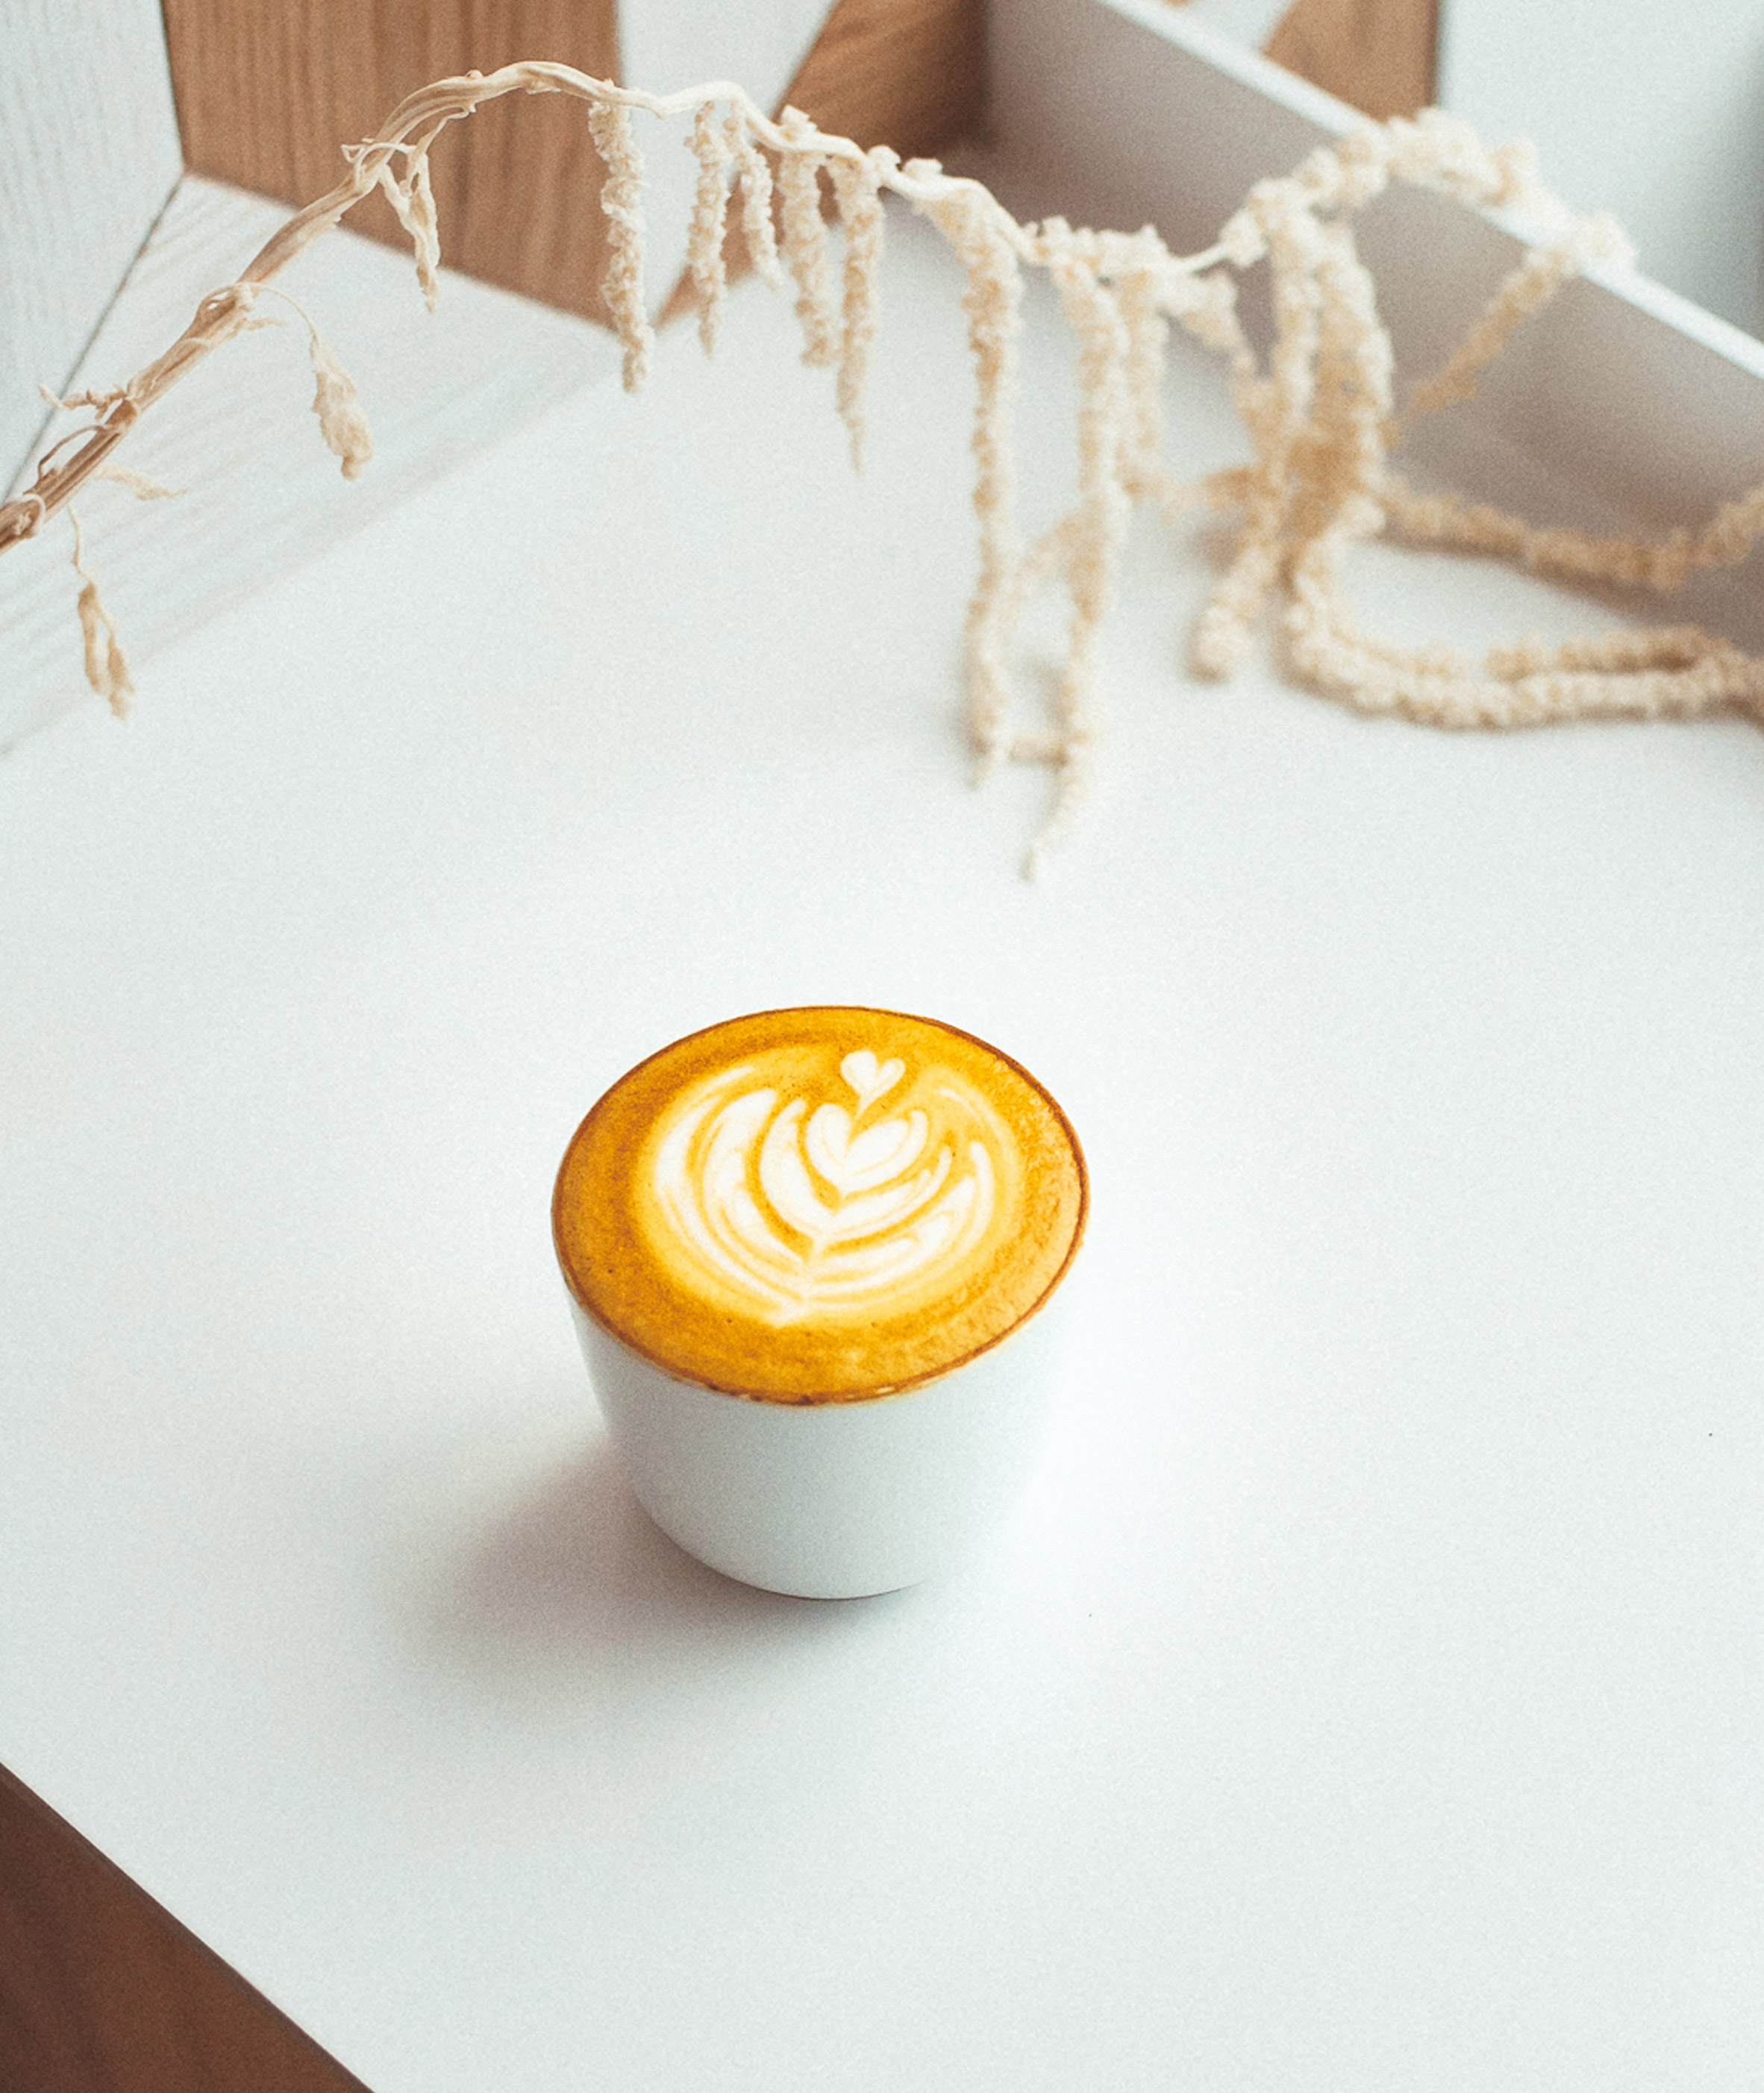 Milky's coffee bar by Batay-Csorba